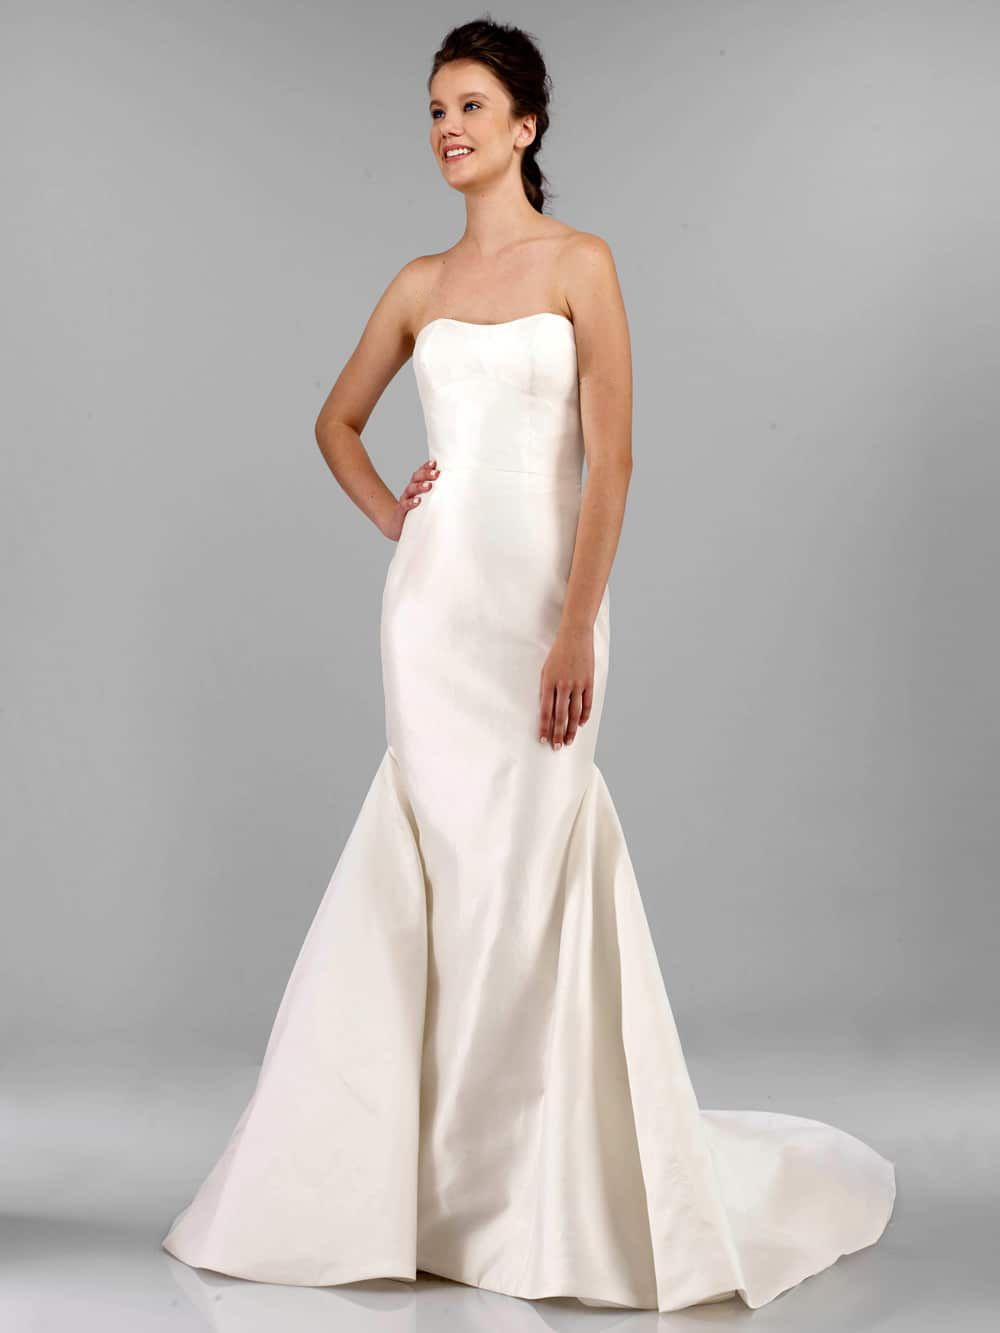 Erica with images dresses york dress wedding dresses